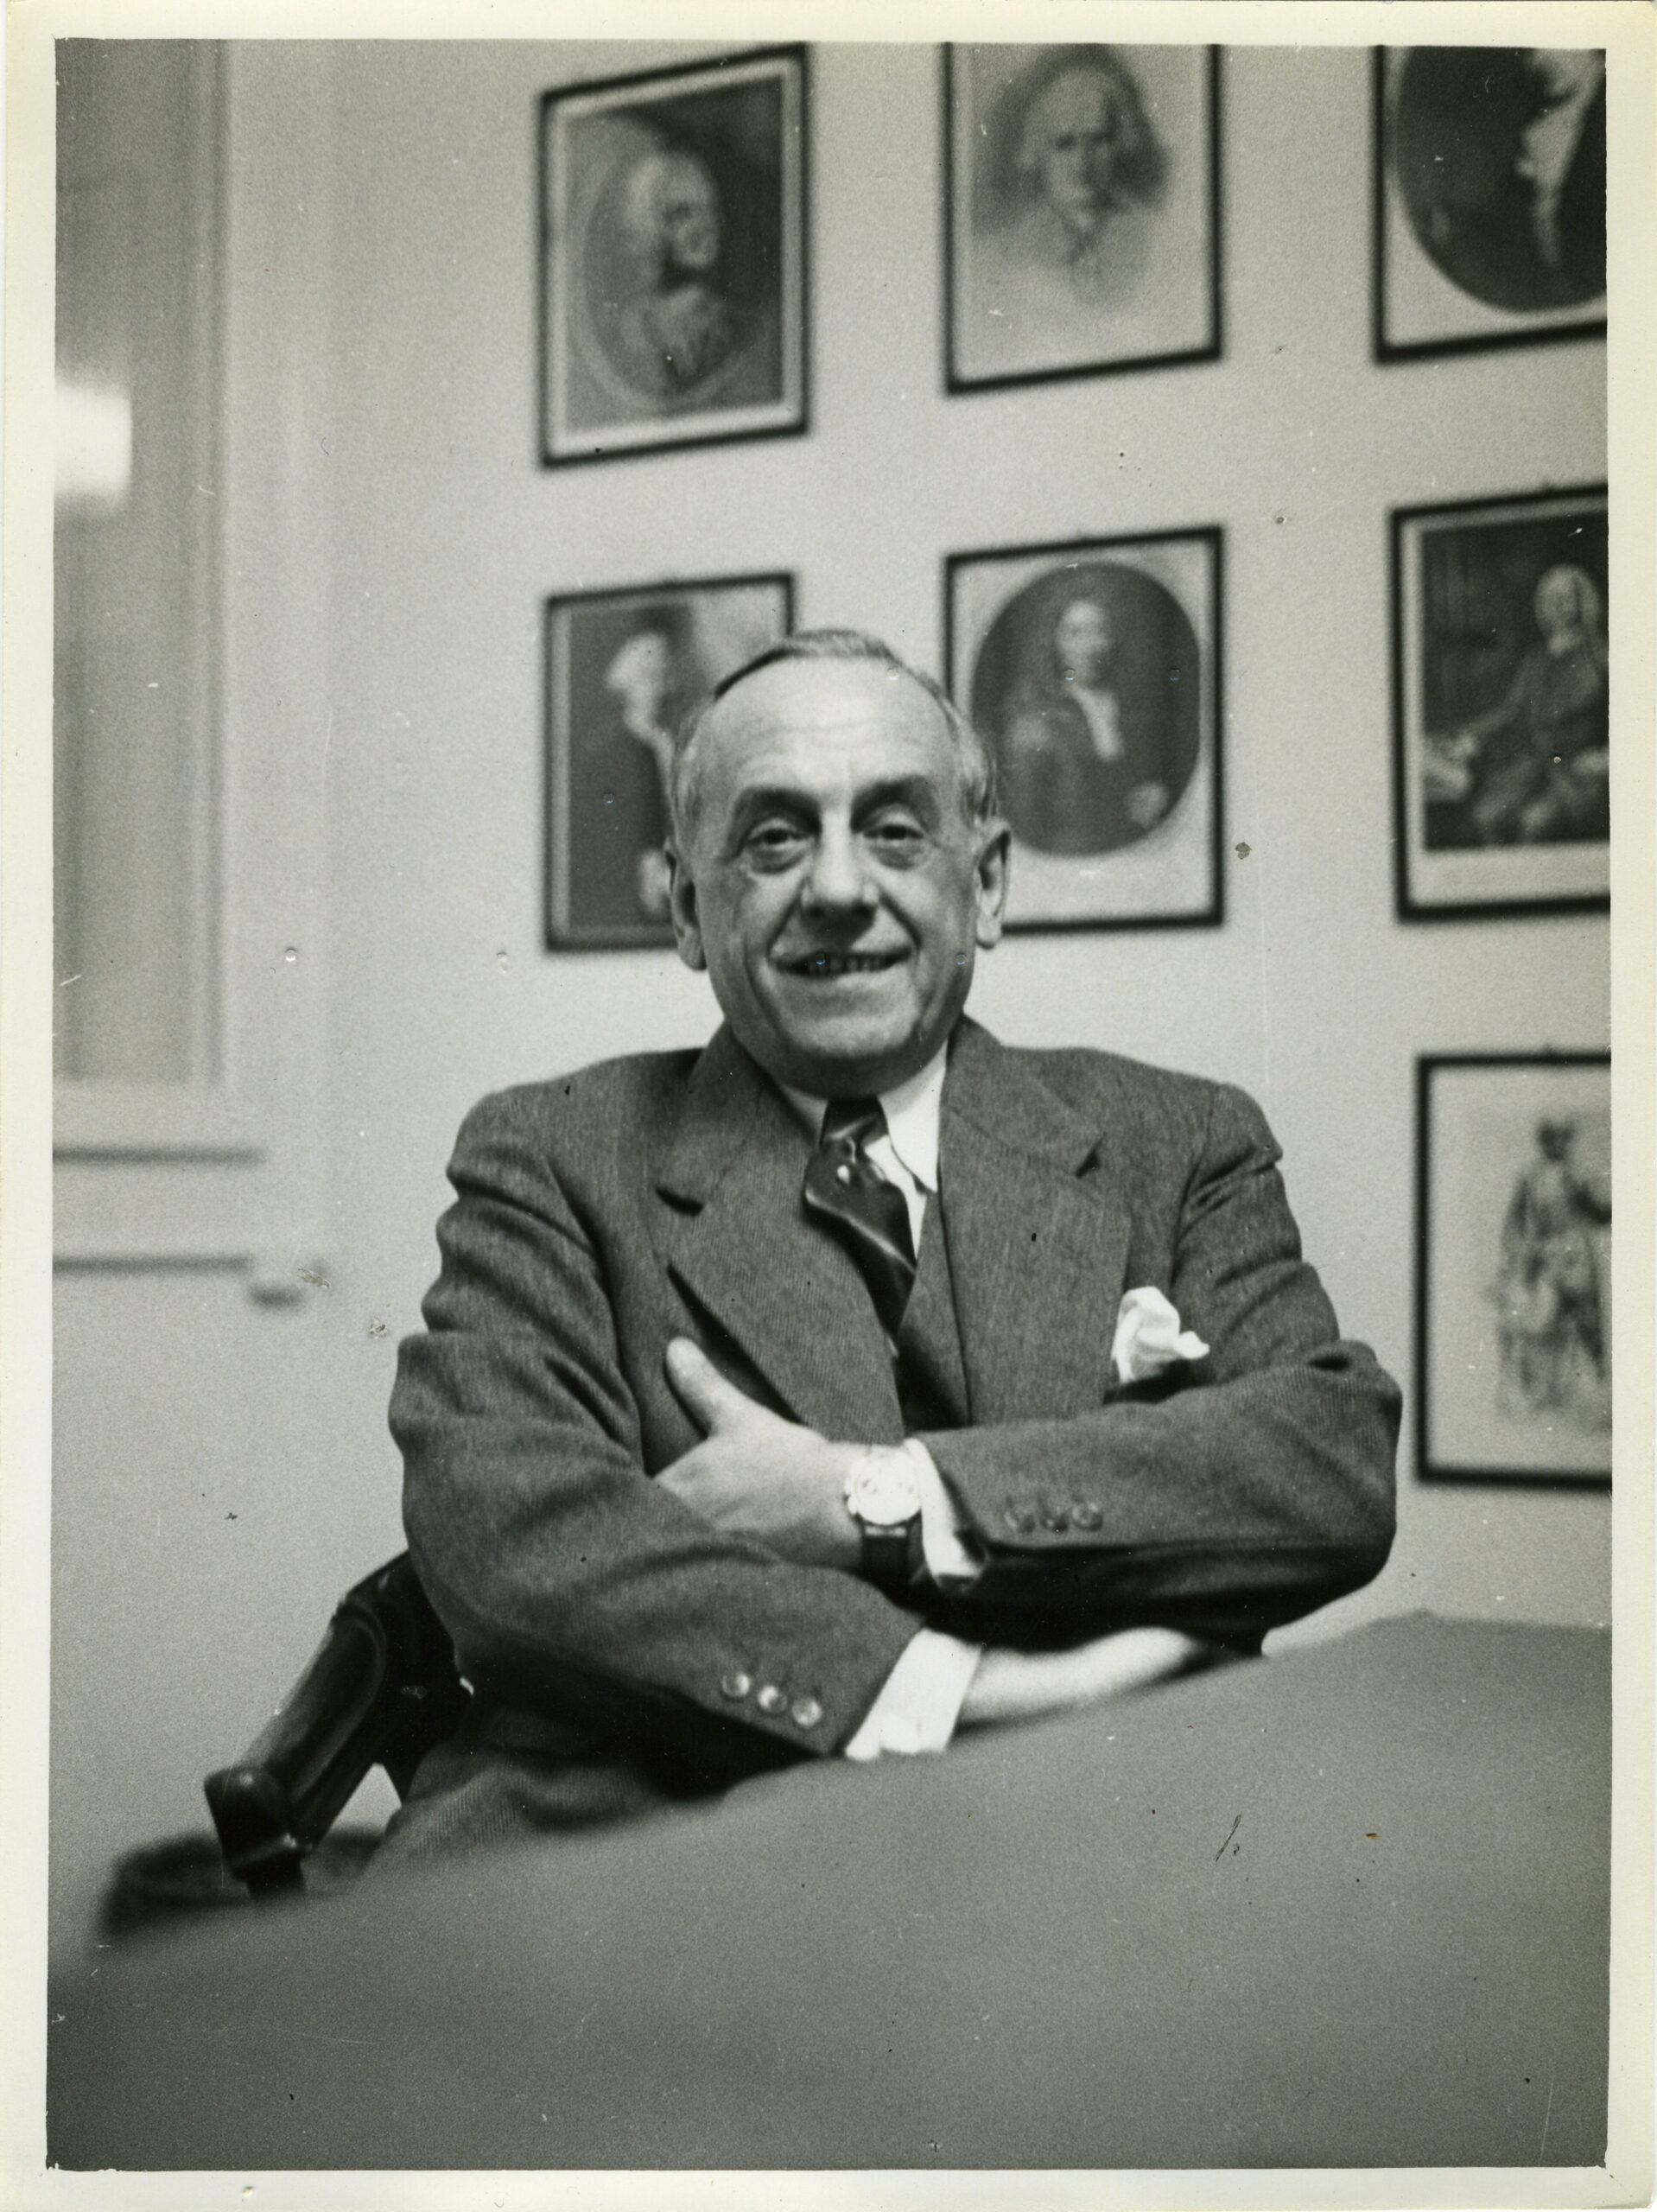 Charles-Edouard Heuer in the year 1953